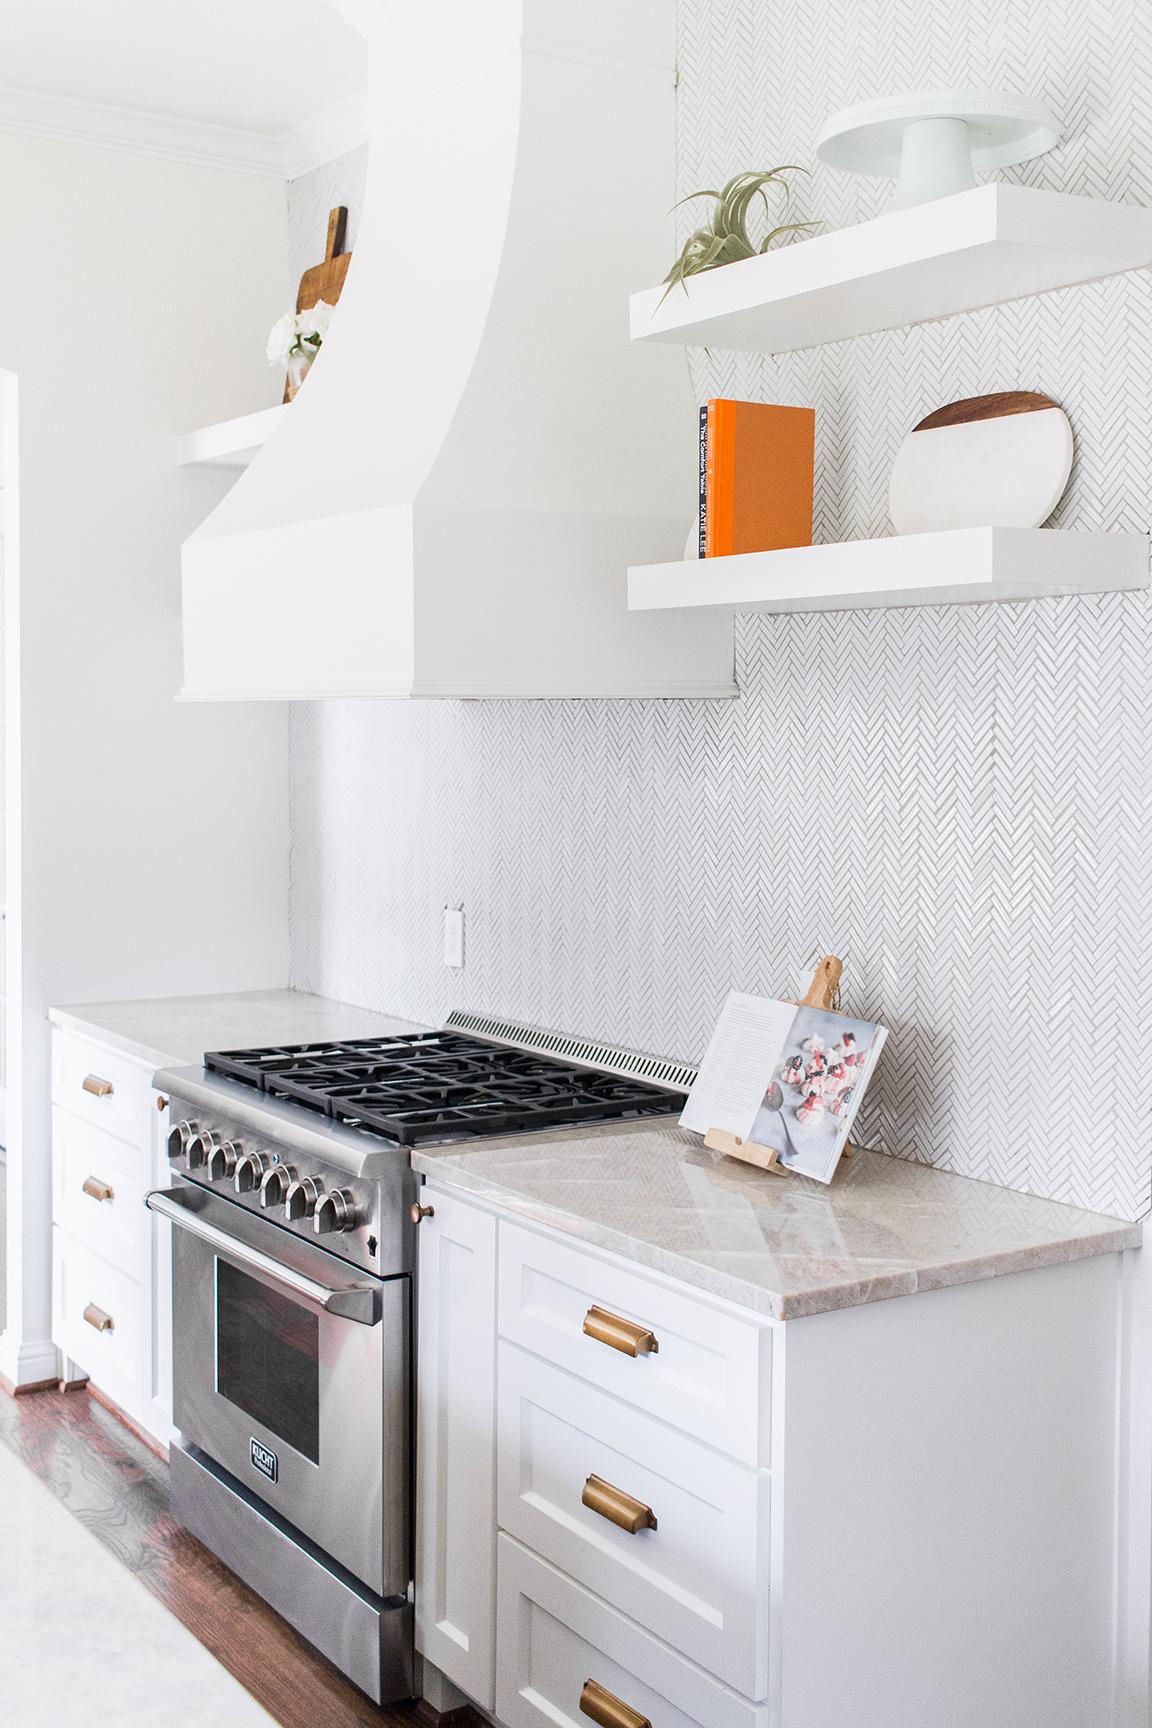 Michelles house- Home Bunch-0012.jpg